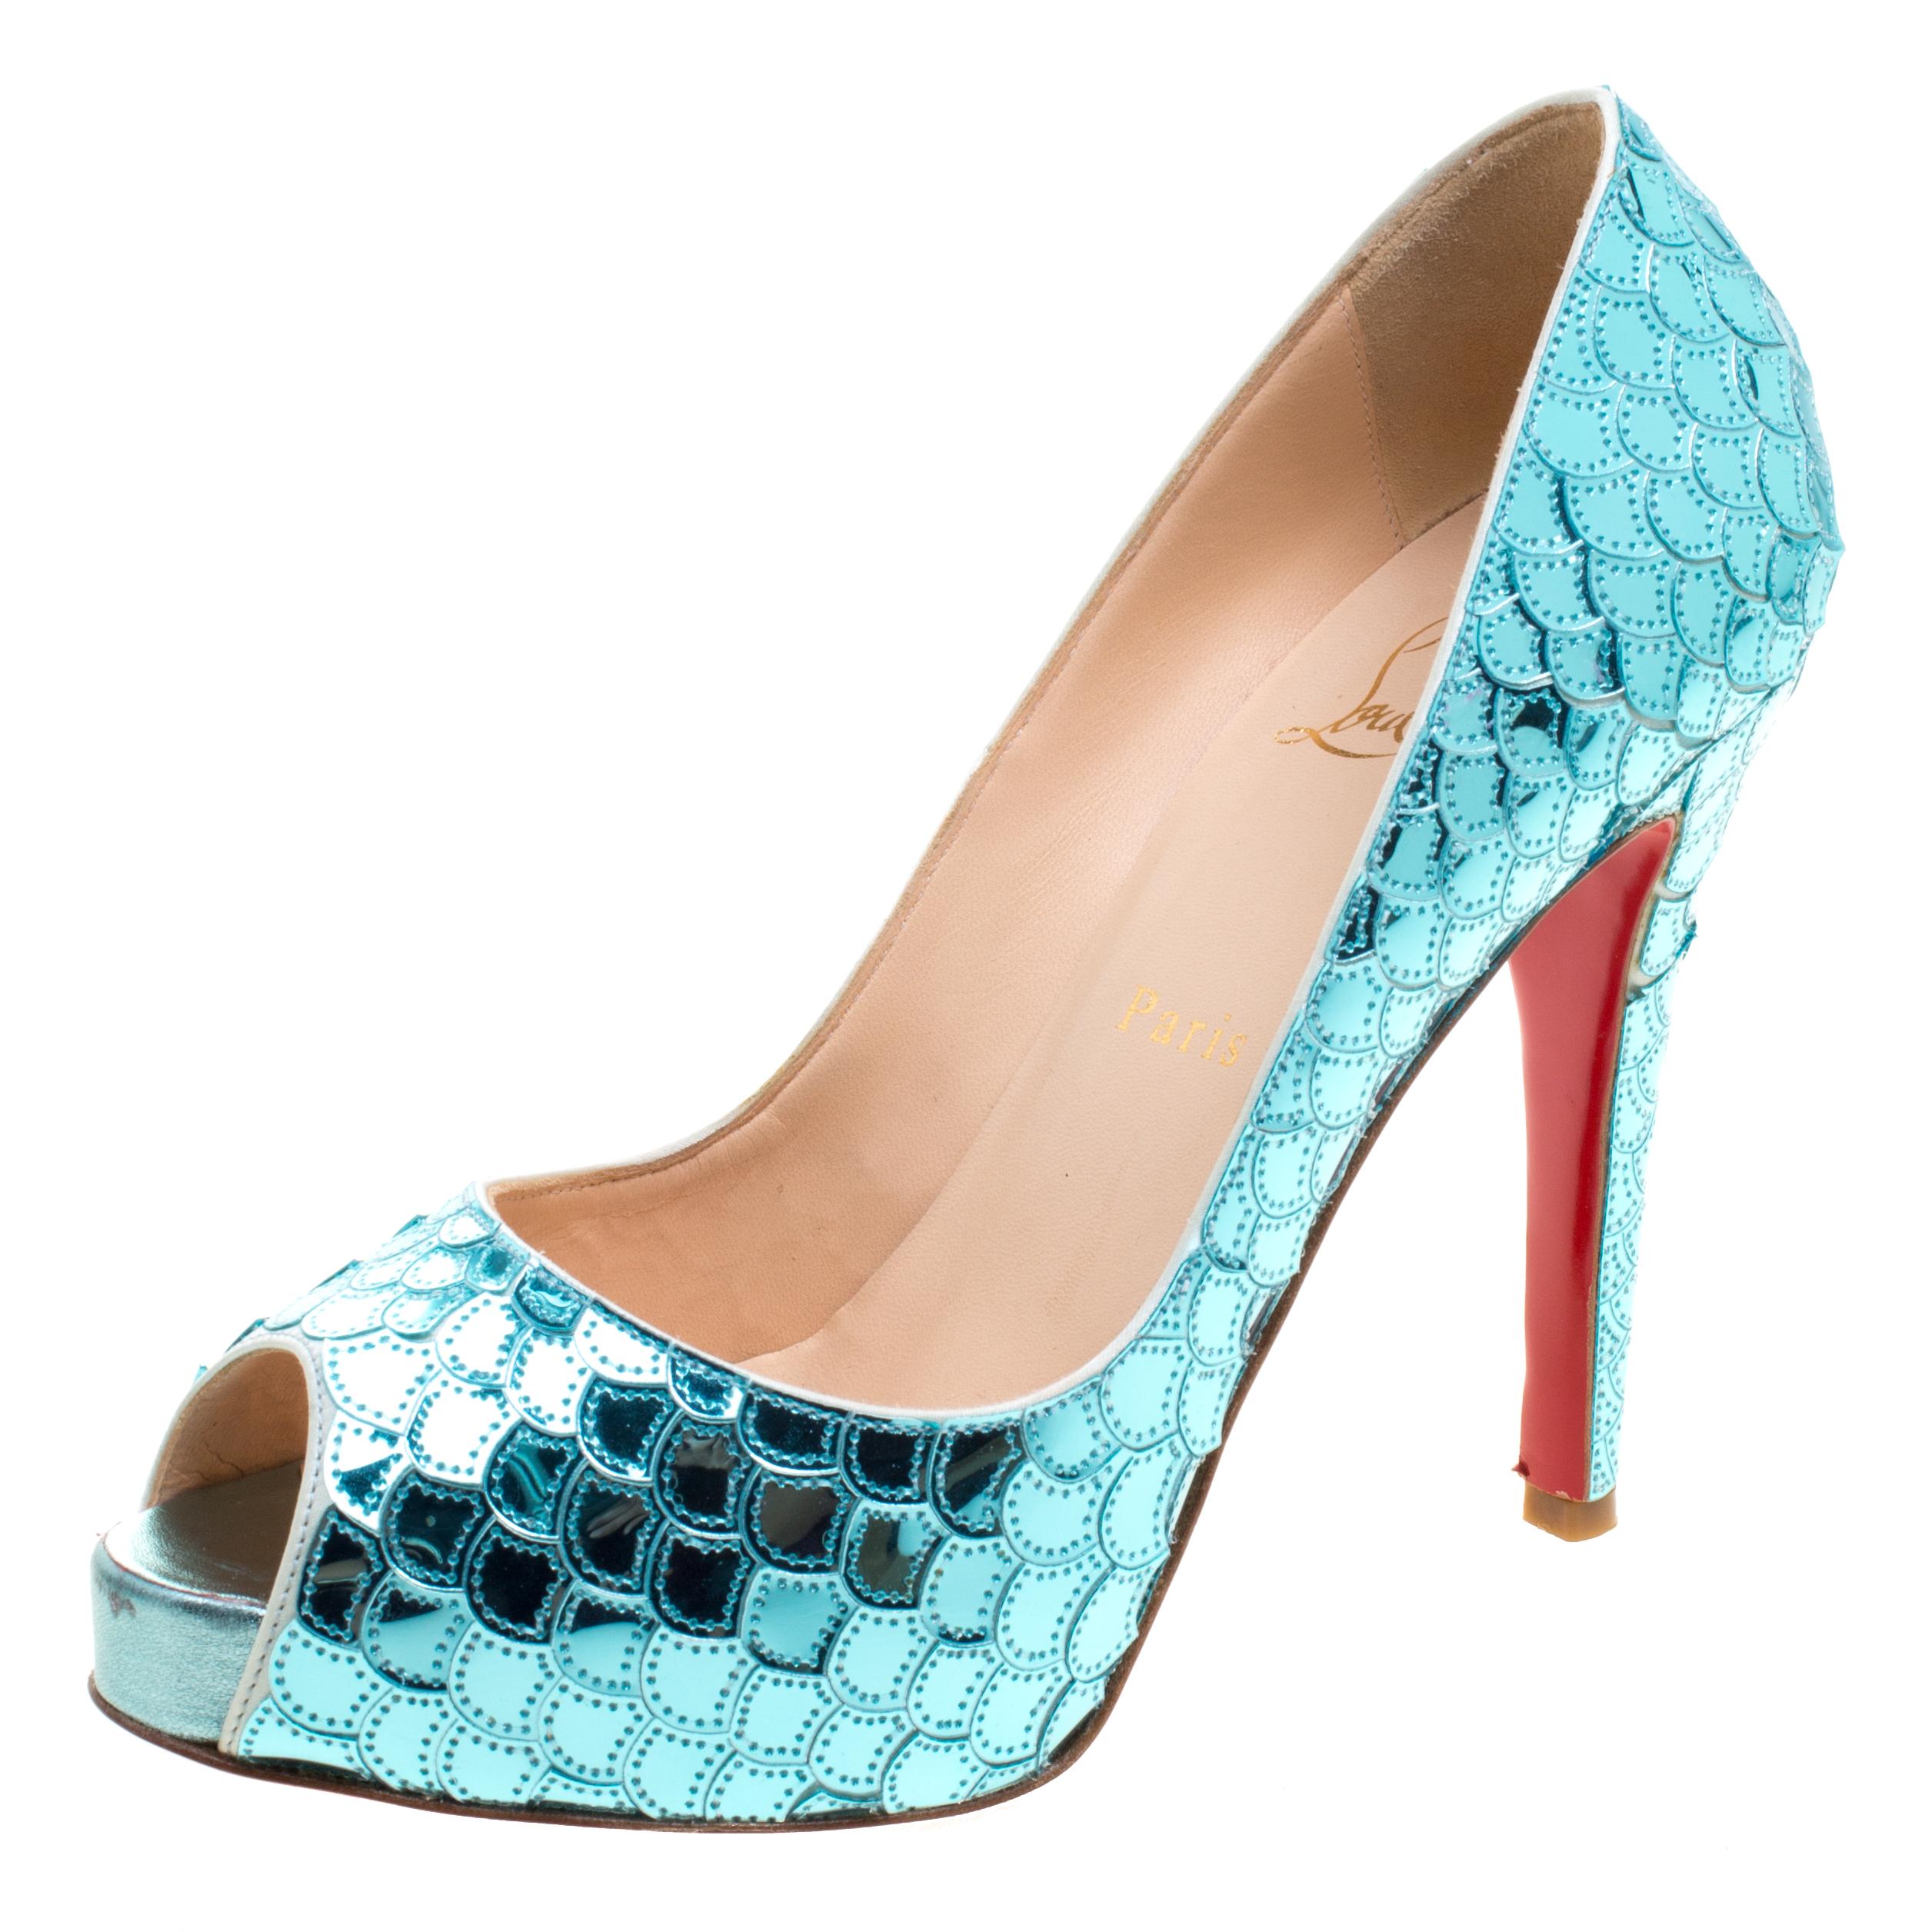 Buy Christian Louboutin Metallic Blue Scaled Leather Poseidon Peep ... caba664322d4